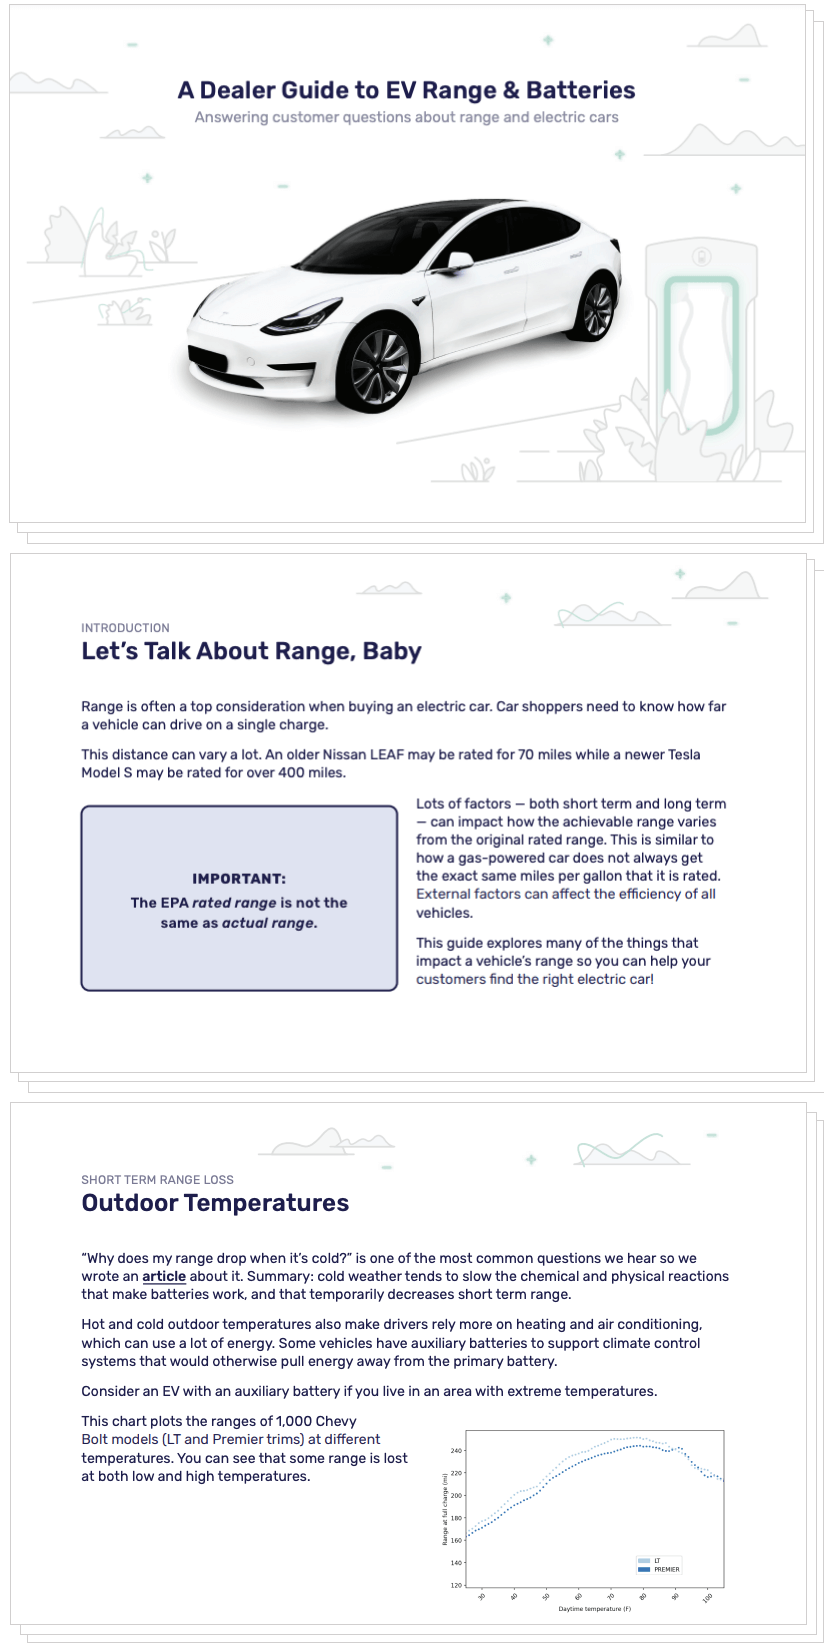 White paper on EV range for car dealers